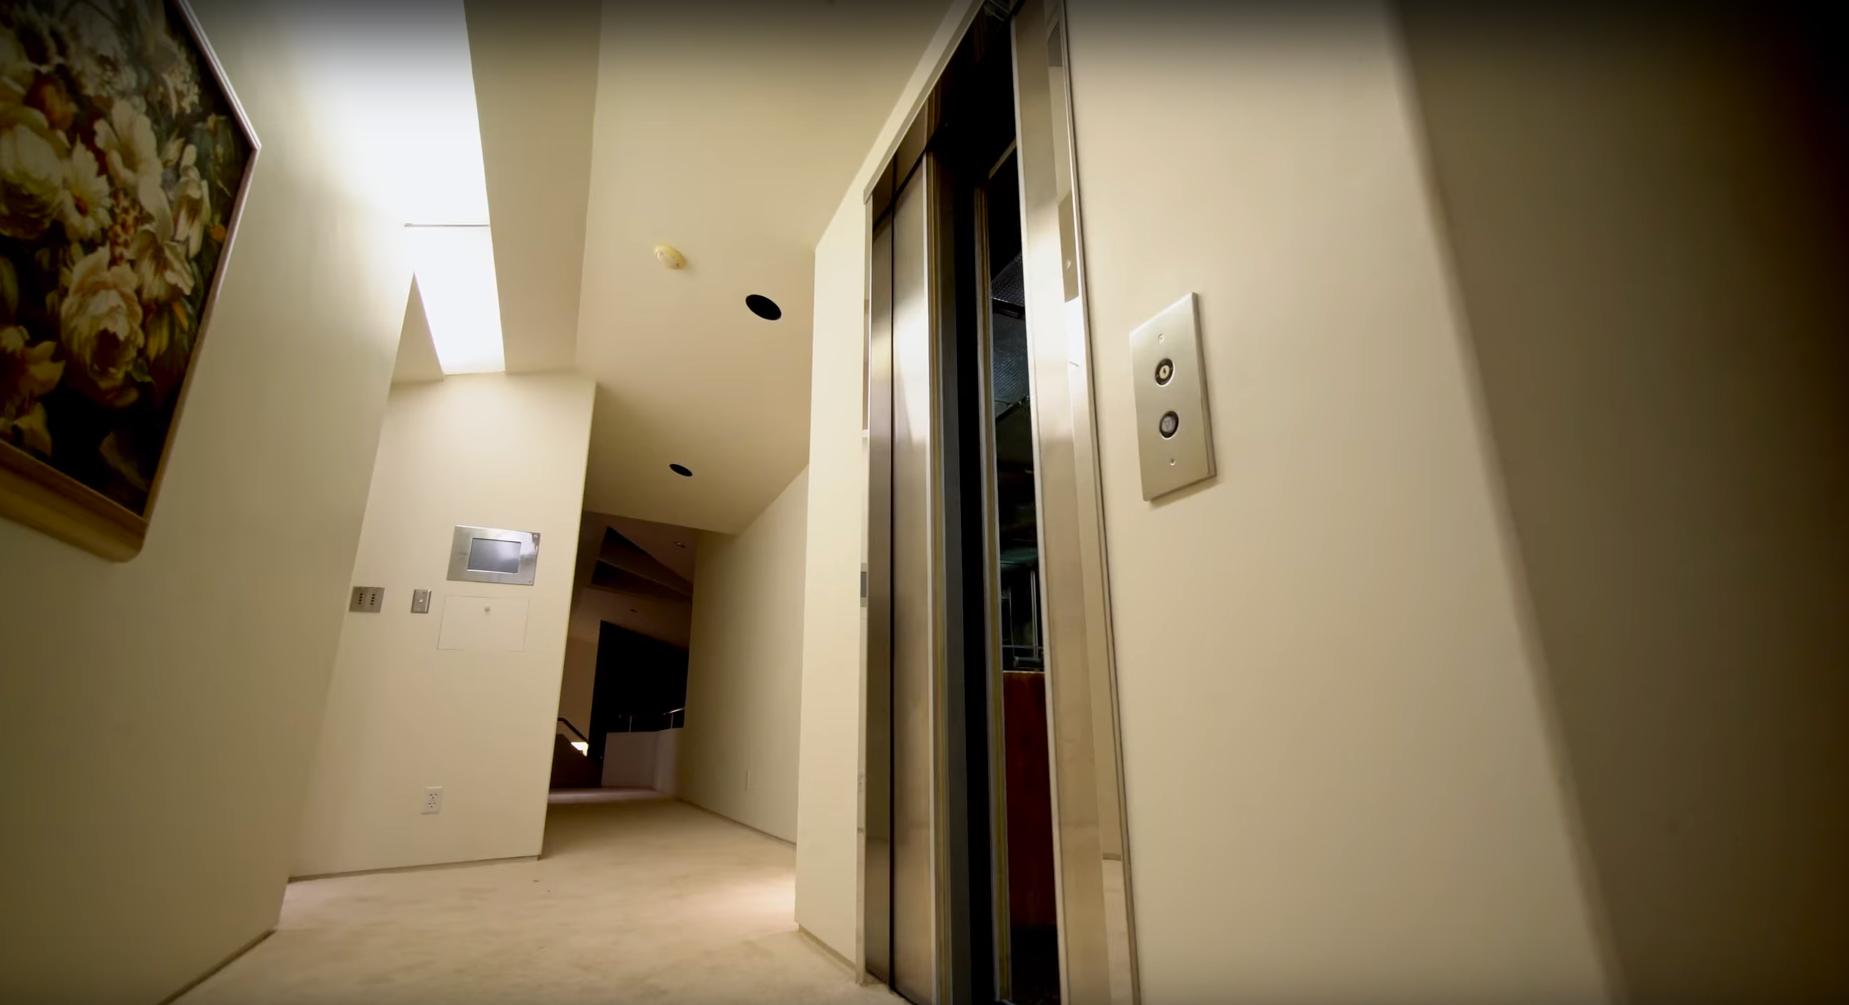 Pharrell Williams' elevator